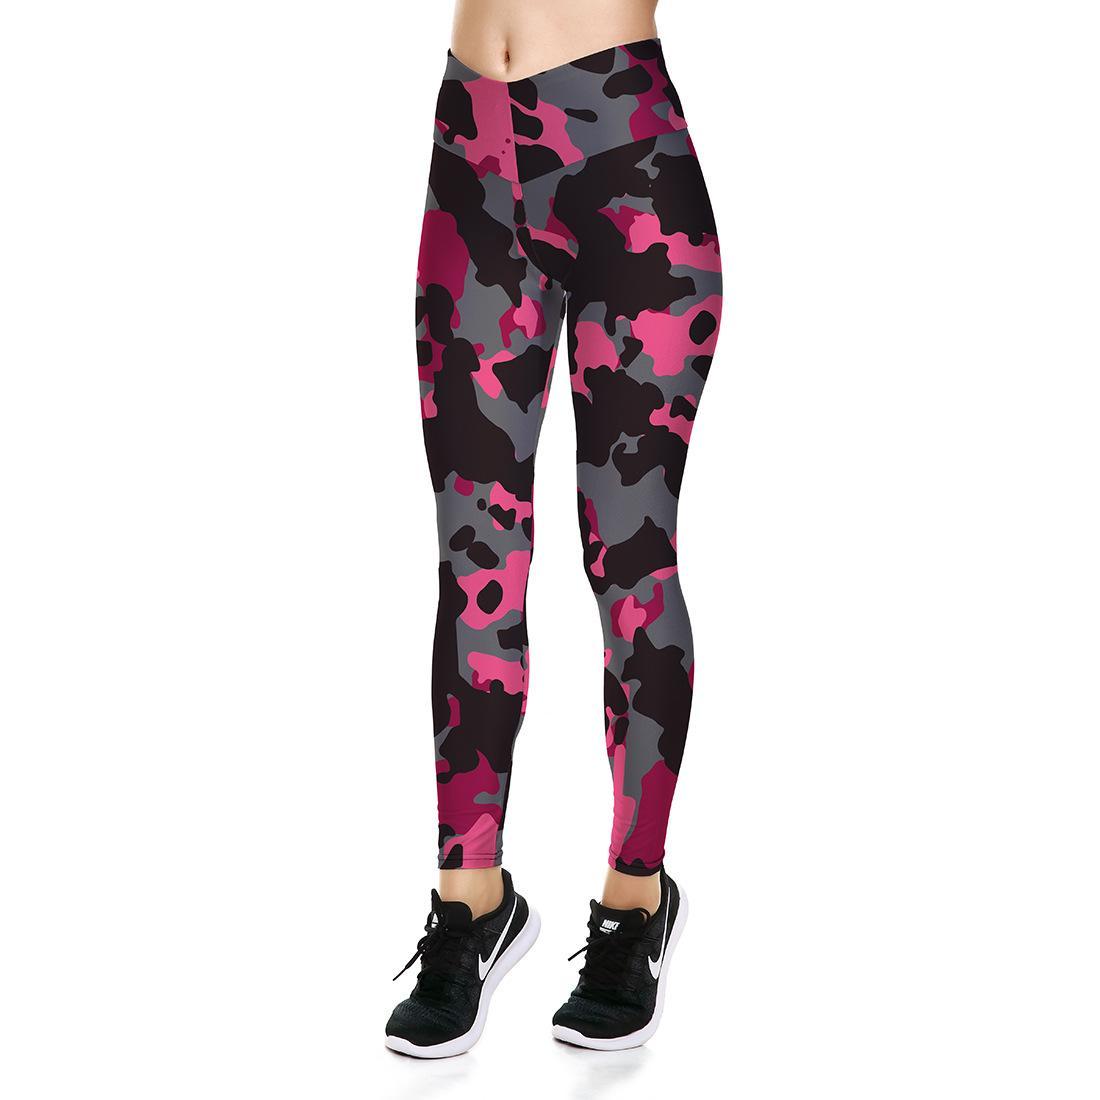 bb3db80457b847 2019 Women'S High Waisted Yoga Pants Pink Camouflage Printed Leggings For Gym  Fitness Sports Pants LGS31 · RaoRanDang Women's Color Block ...